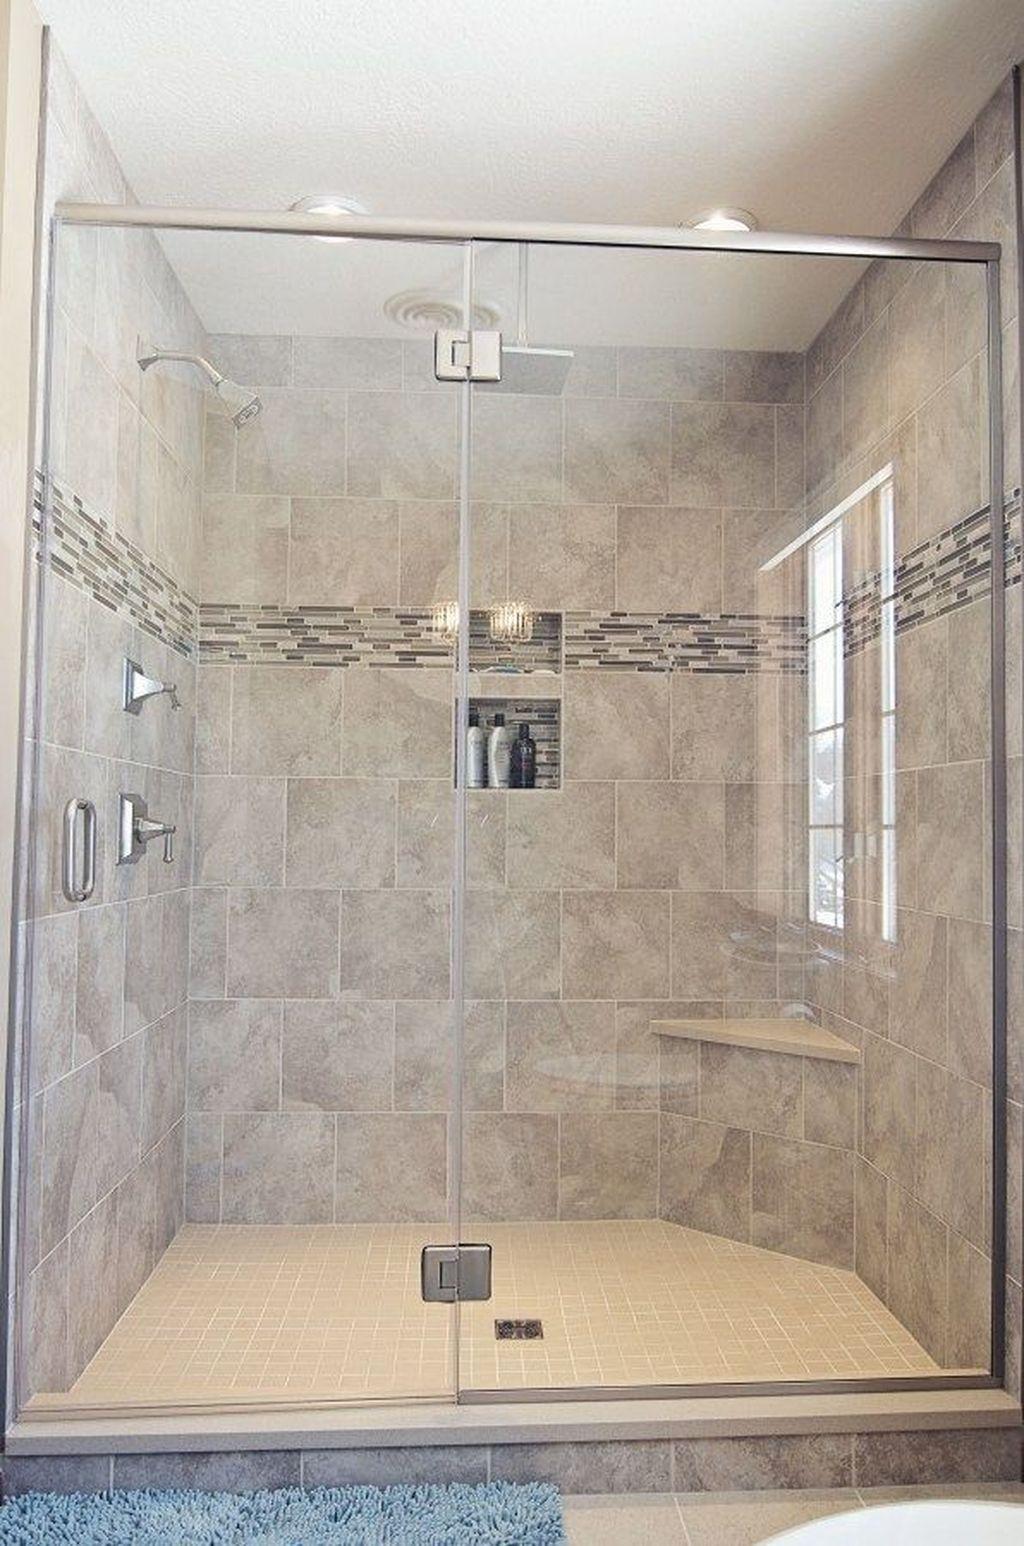 34 Lovely Bathroom Ceramic Tile Ideas You Should Copy Pimphomee In 2020 Bathrooms Remodel Restroom Remodel Bathroom Remodel Shower